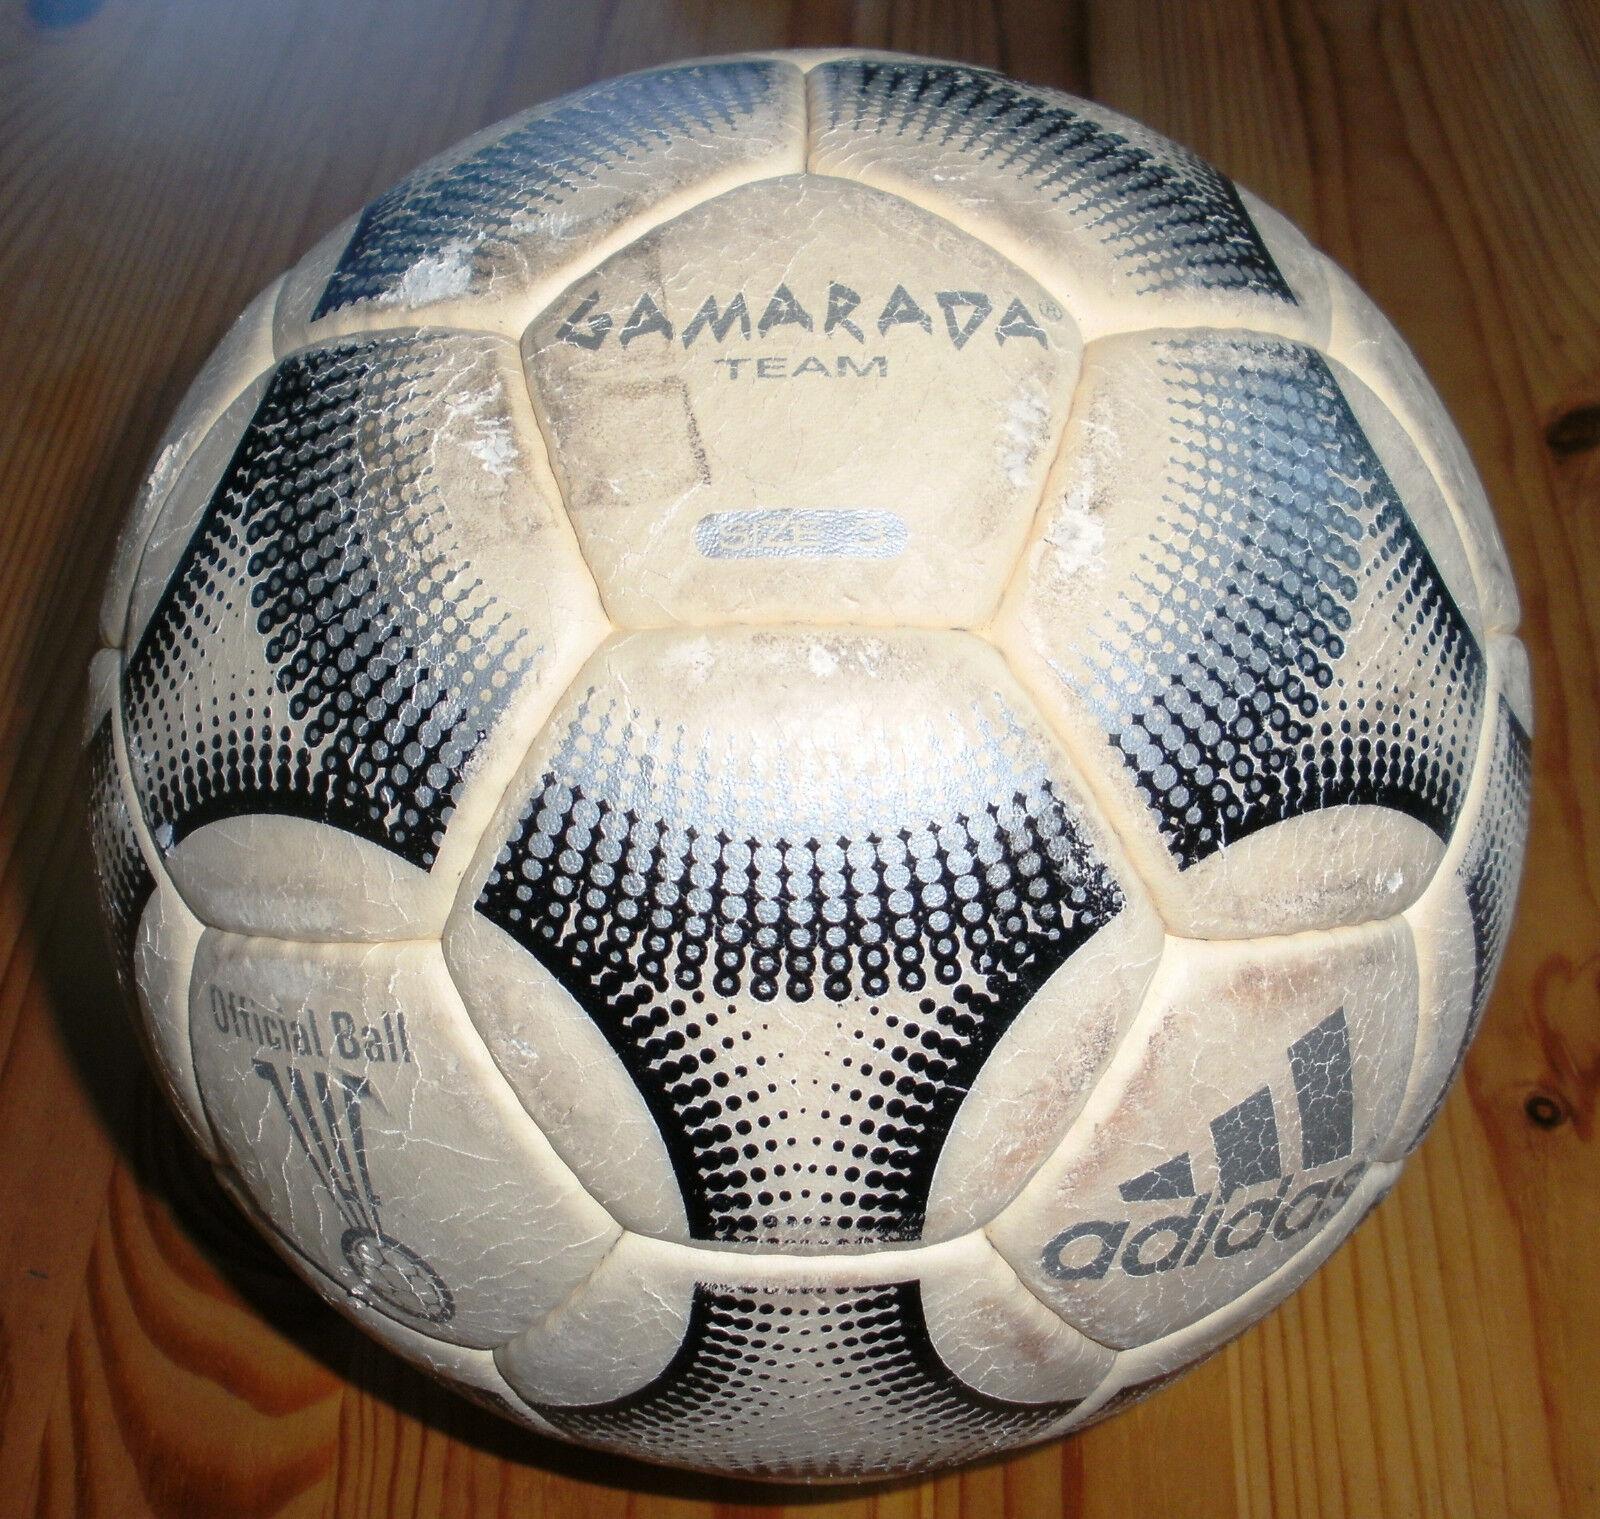 Adidas Gamarada Team Handball IHF official Ball Größe 3 für Sammler